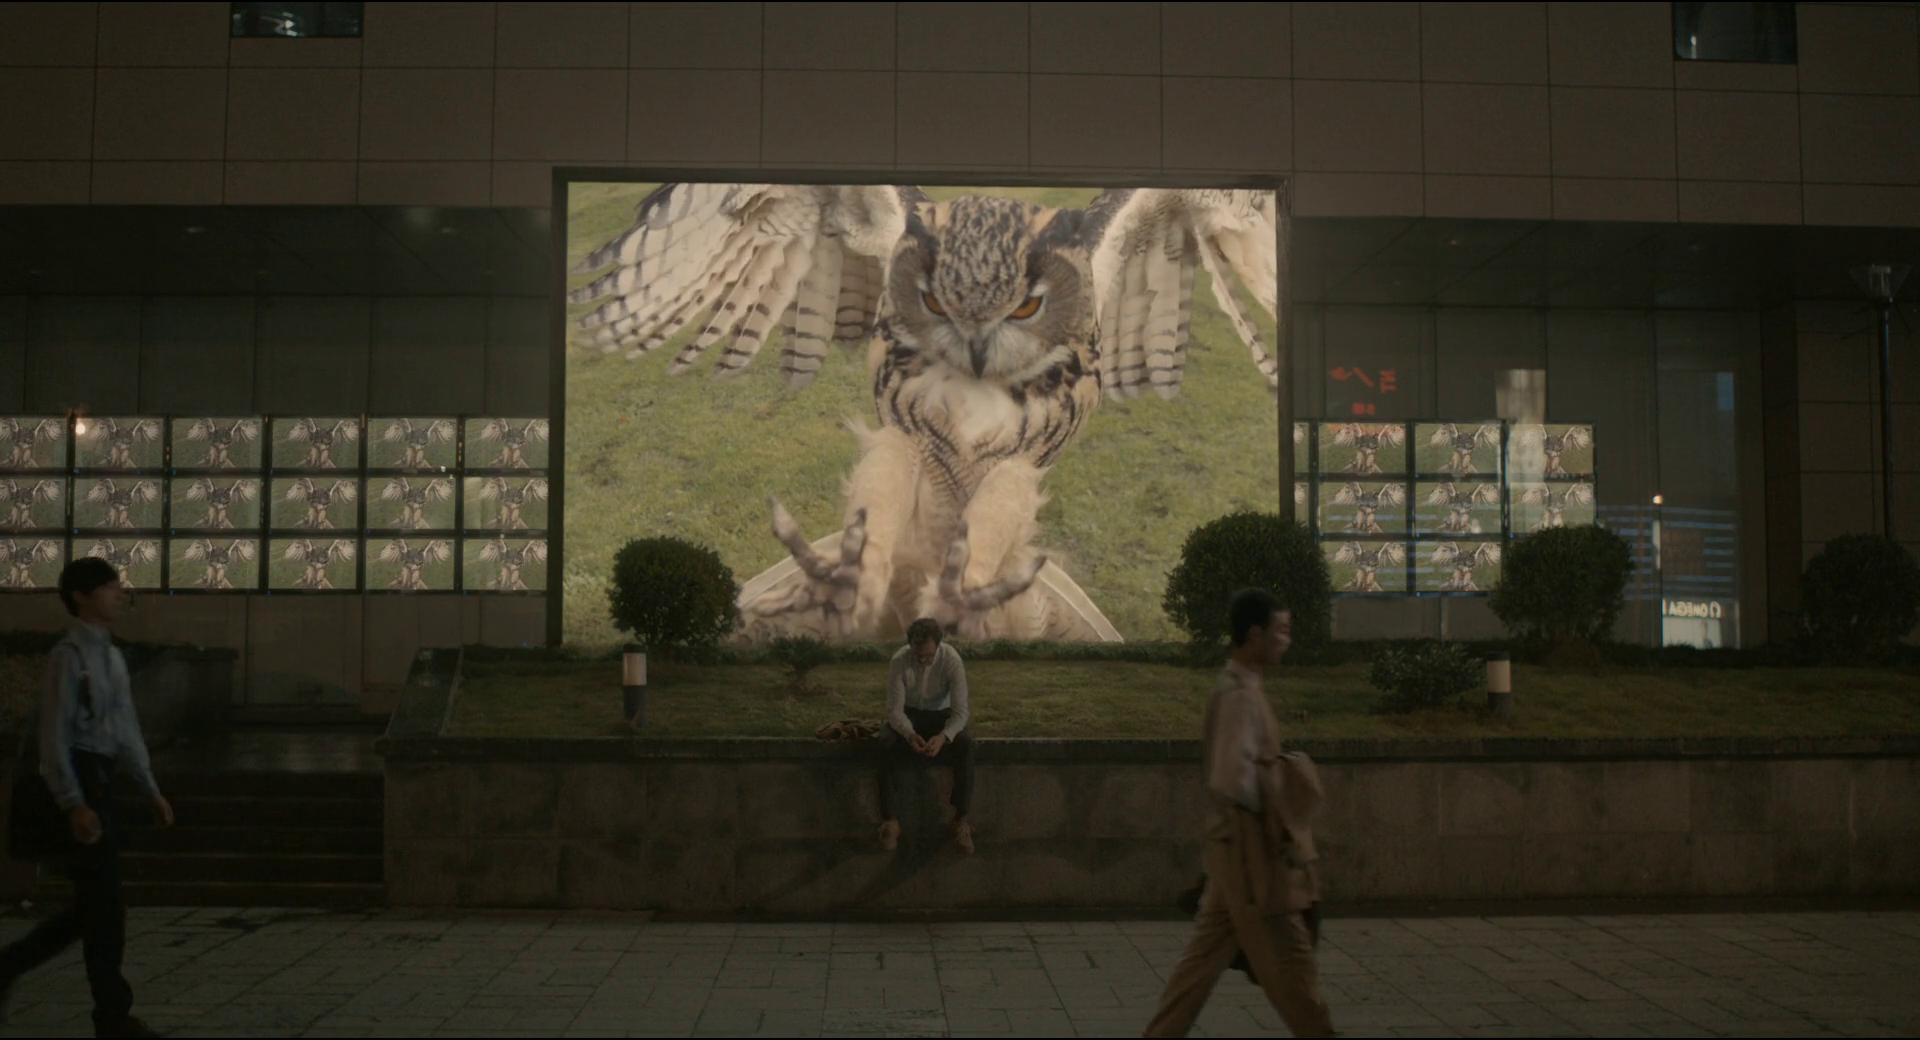 Spike Jonze Her Cinematography , HD Wallpaper & Backgrounds